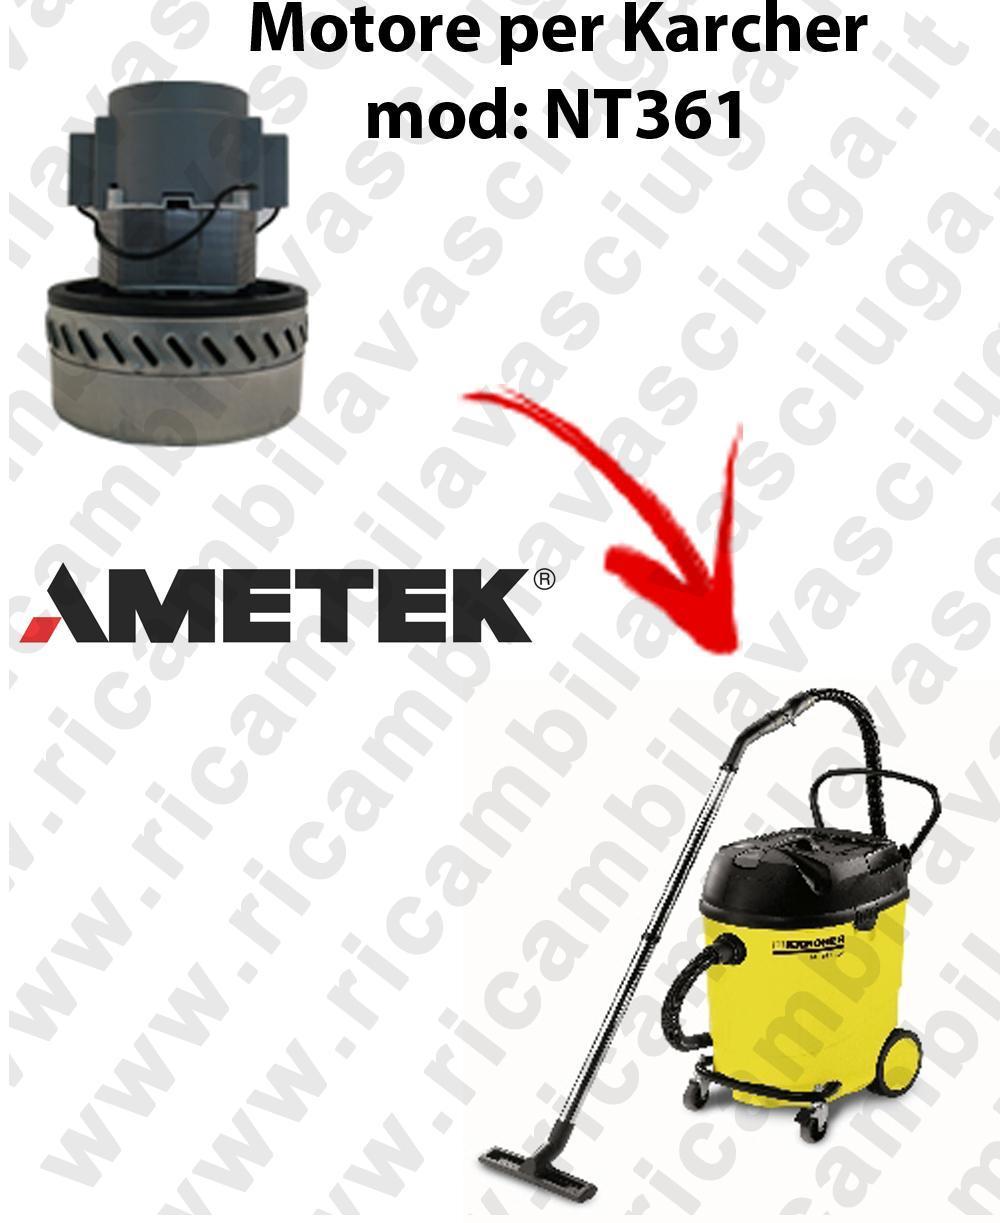 NT361 Ametek Vacuum Motor for vacuum cleaner KARCHER